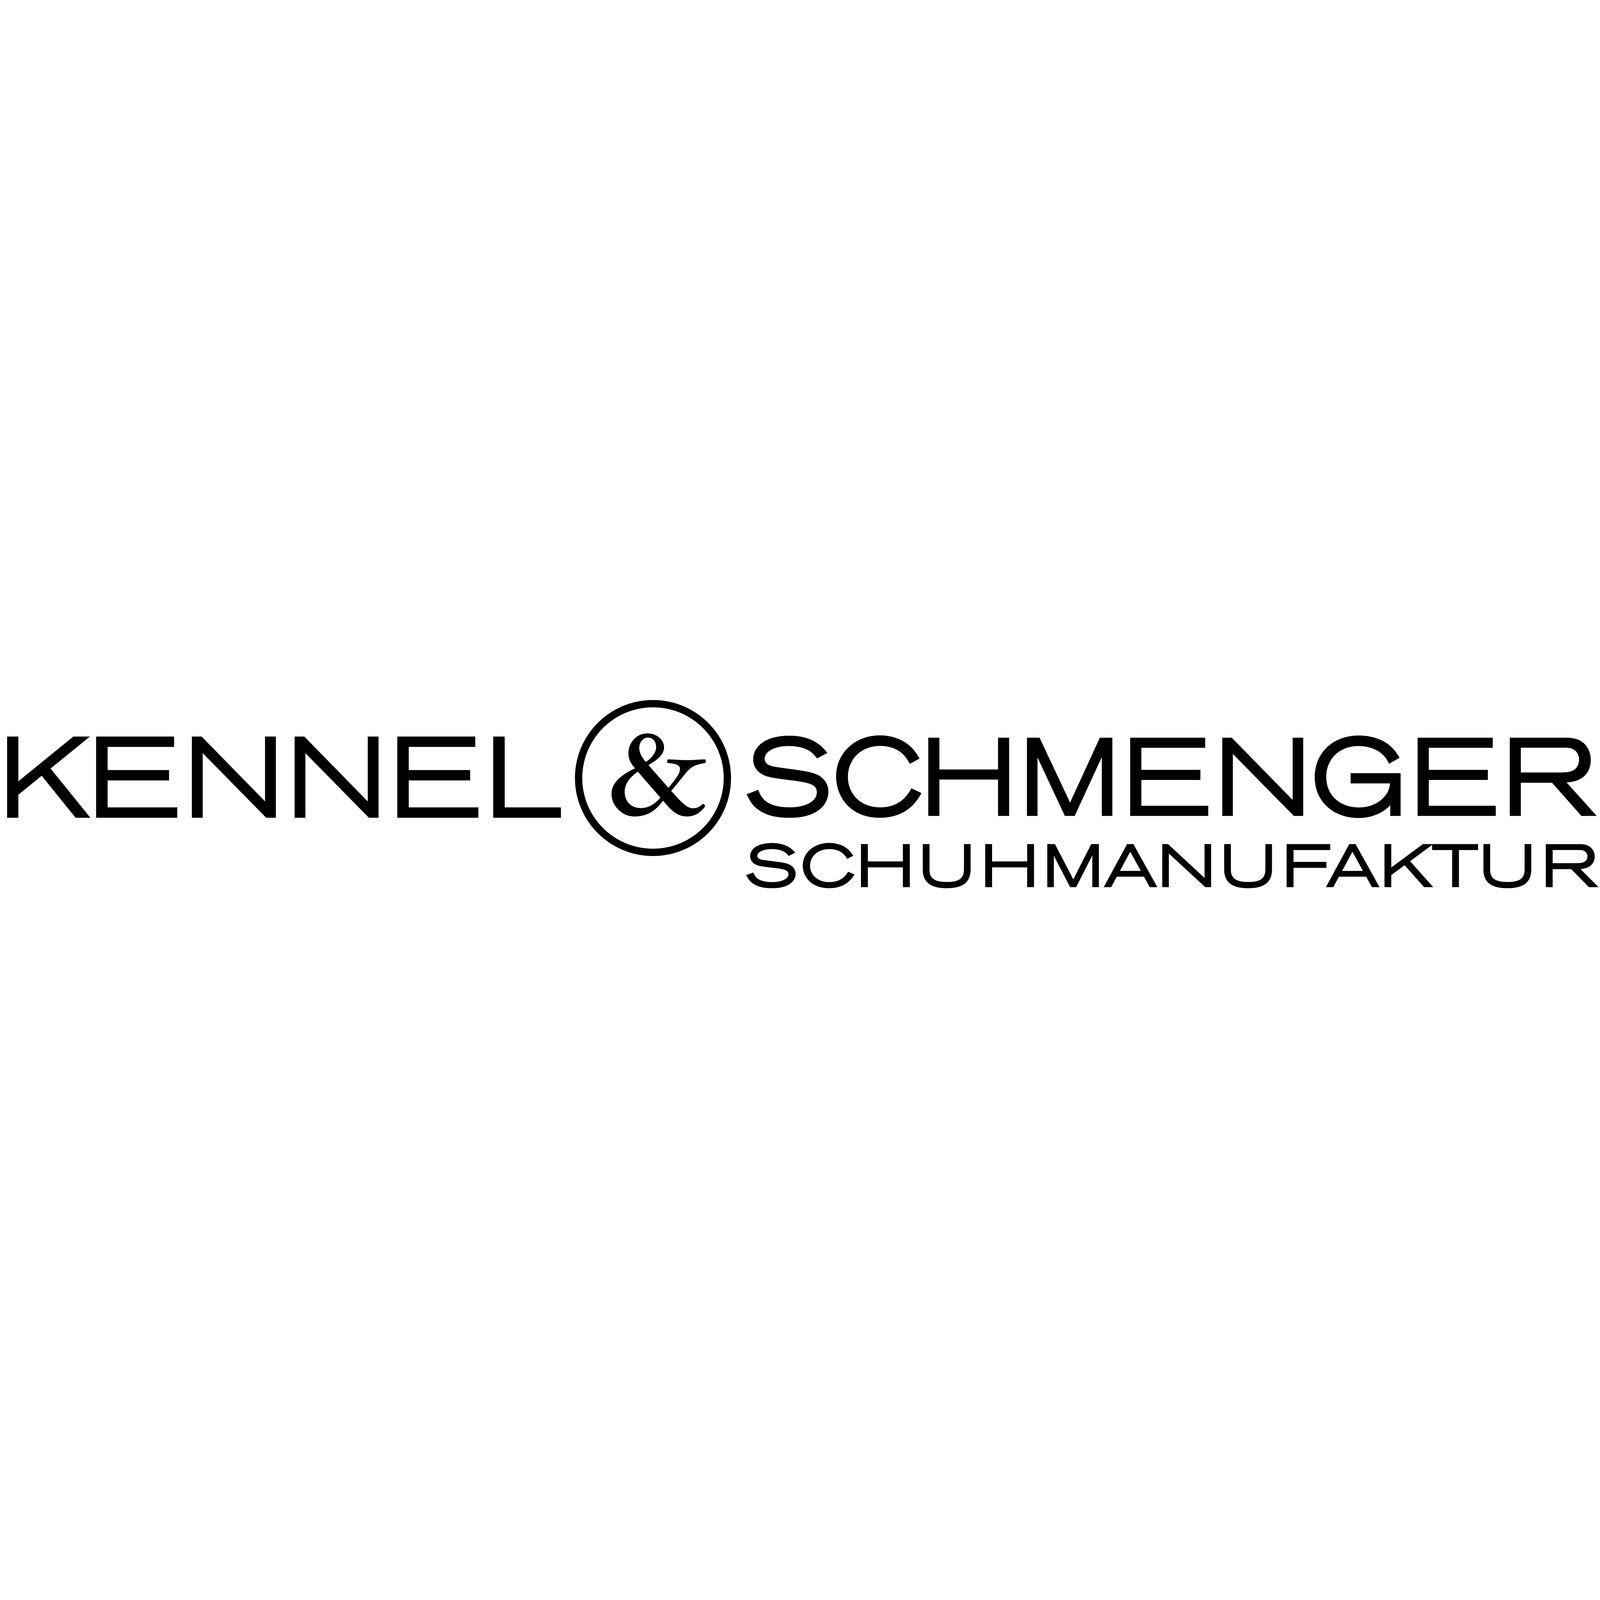 Kennel & Schmenger (Image 1)